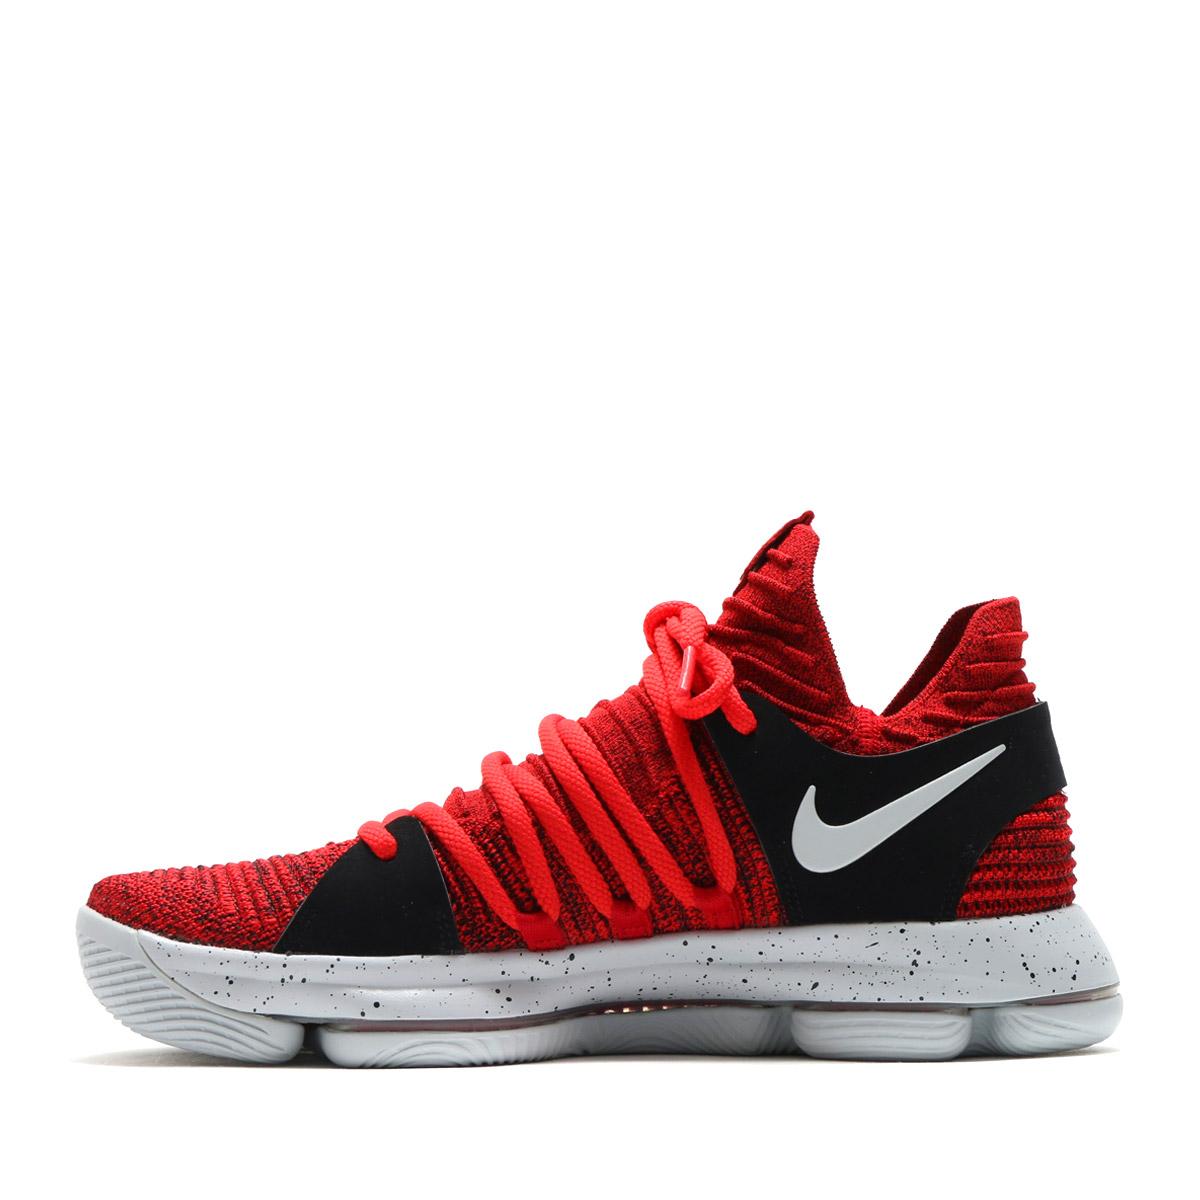 half off 6367c 5afbc NIKE ZOOM KD10 EP (Nike zoom KD10 EP) (UNIVERSITY RED PURE PLATINUM-BLACK)  17FA-S